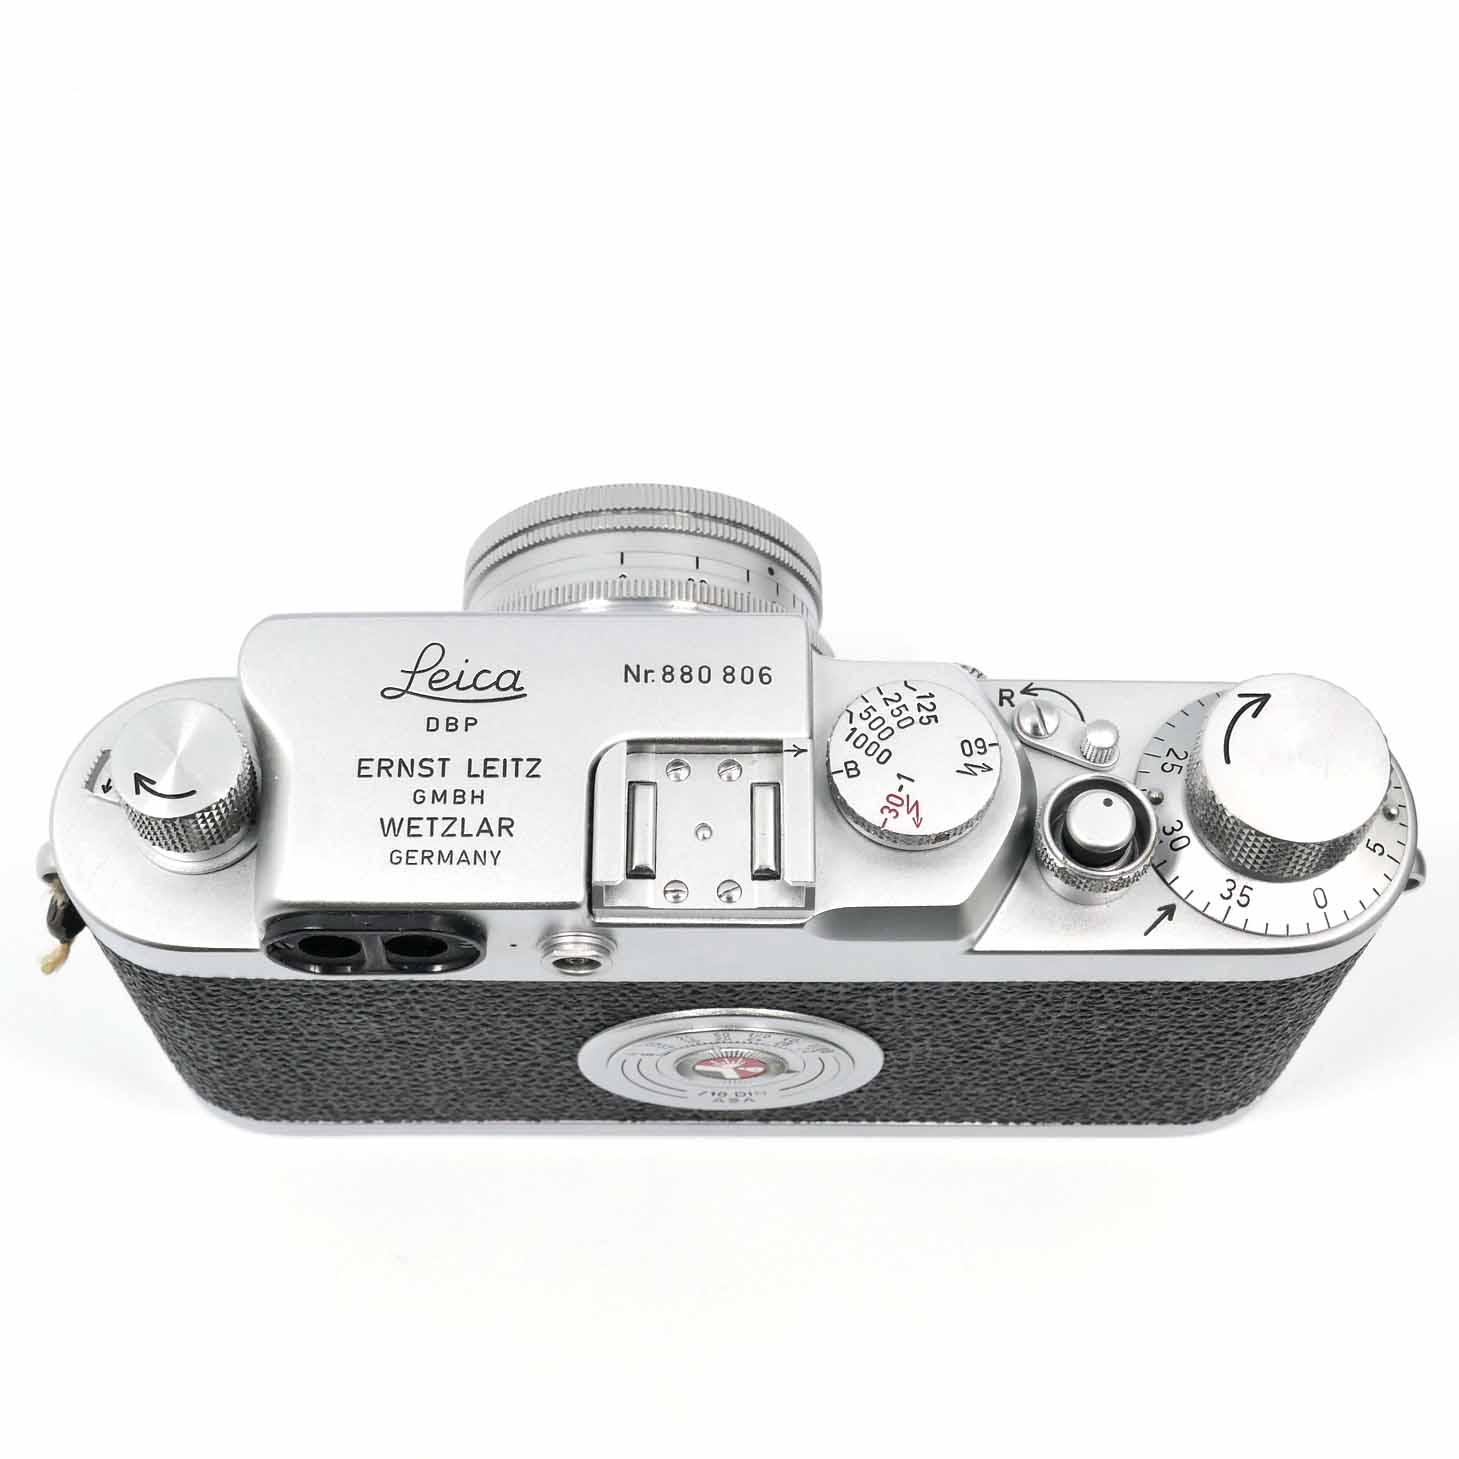 clean-cameras-Leica-IIIg+Summicron-2.0-5cm18